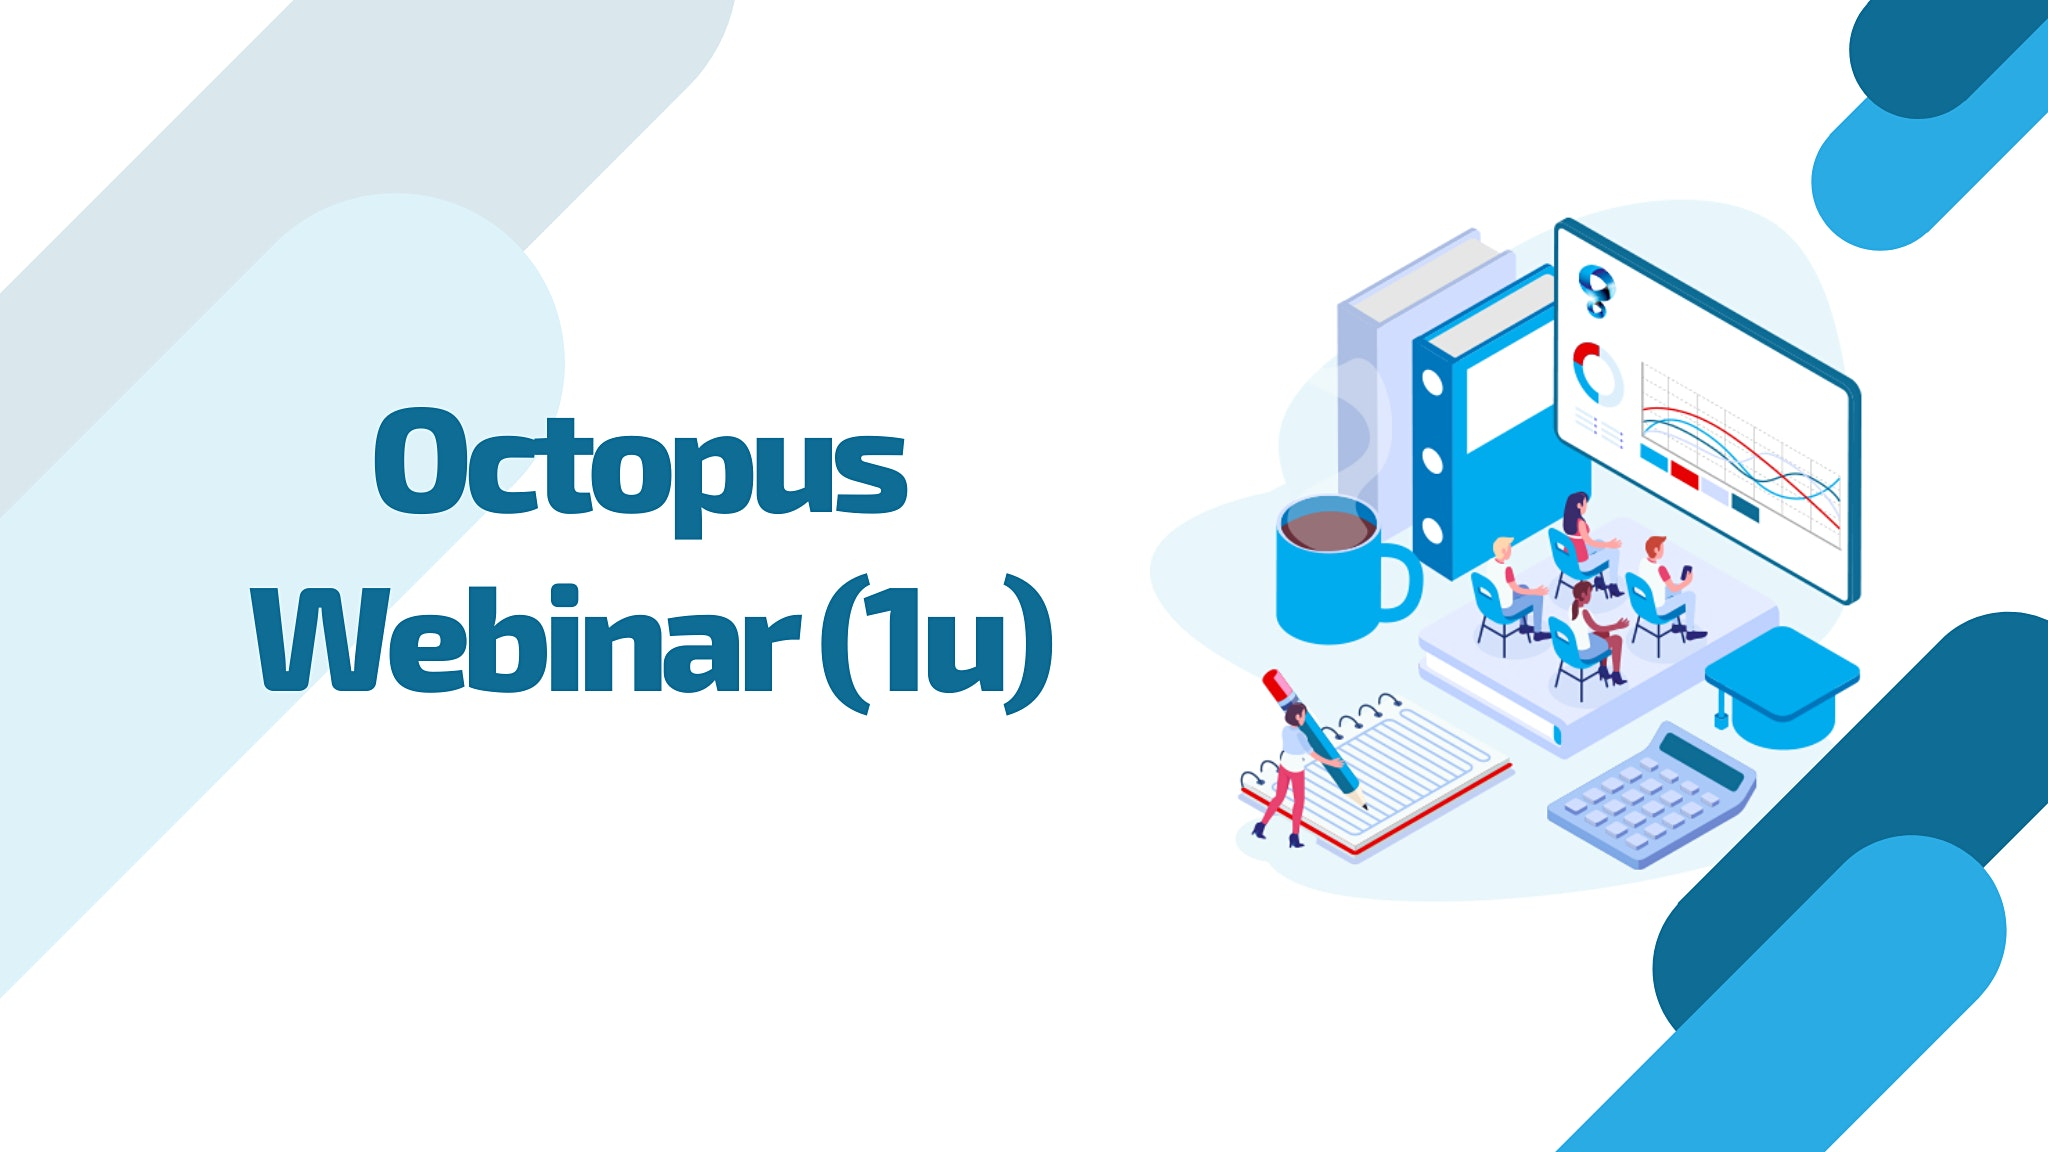 Special: Octopus Webinar: New Release